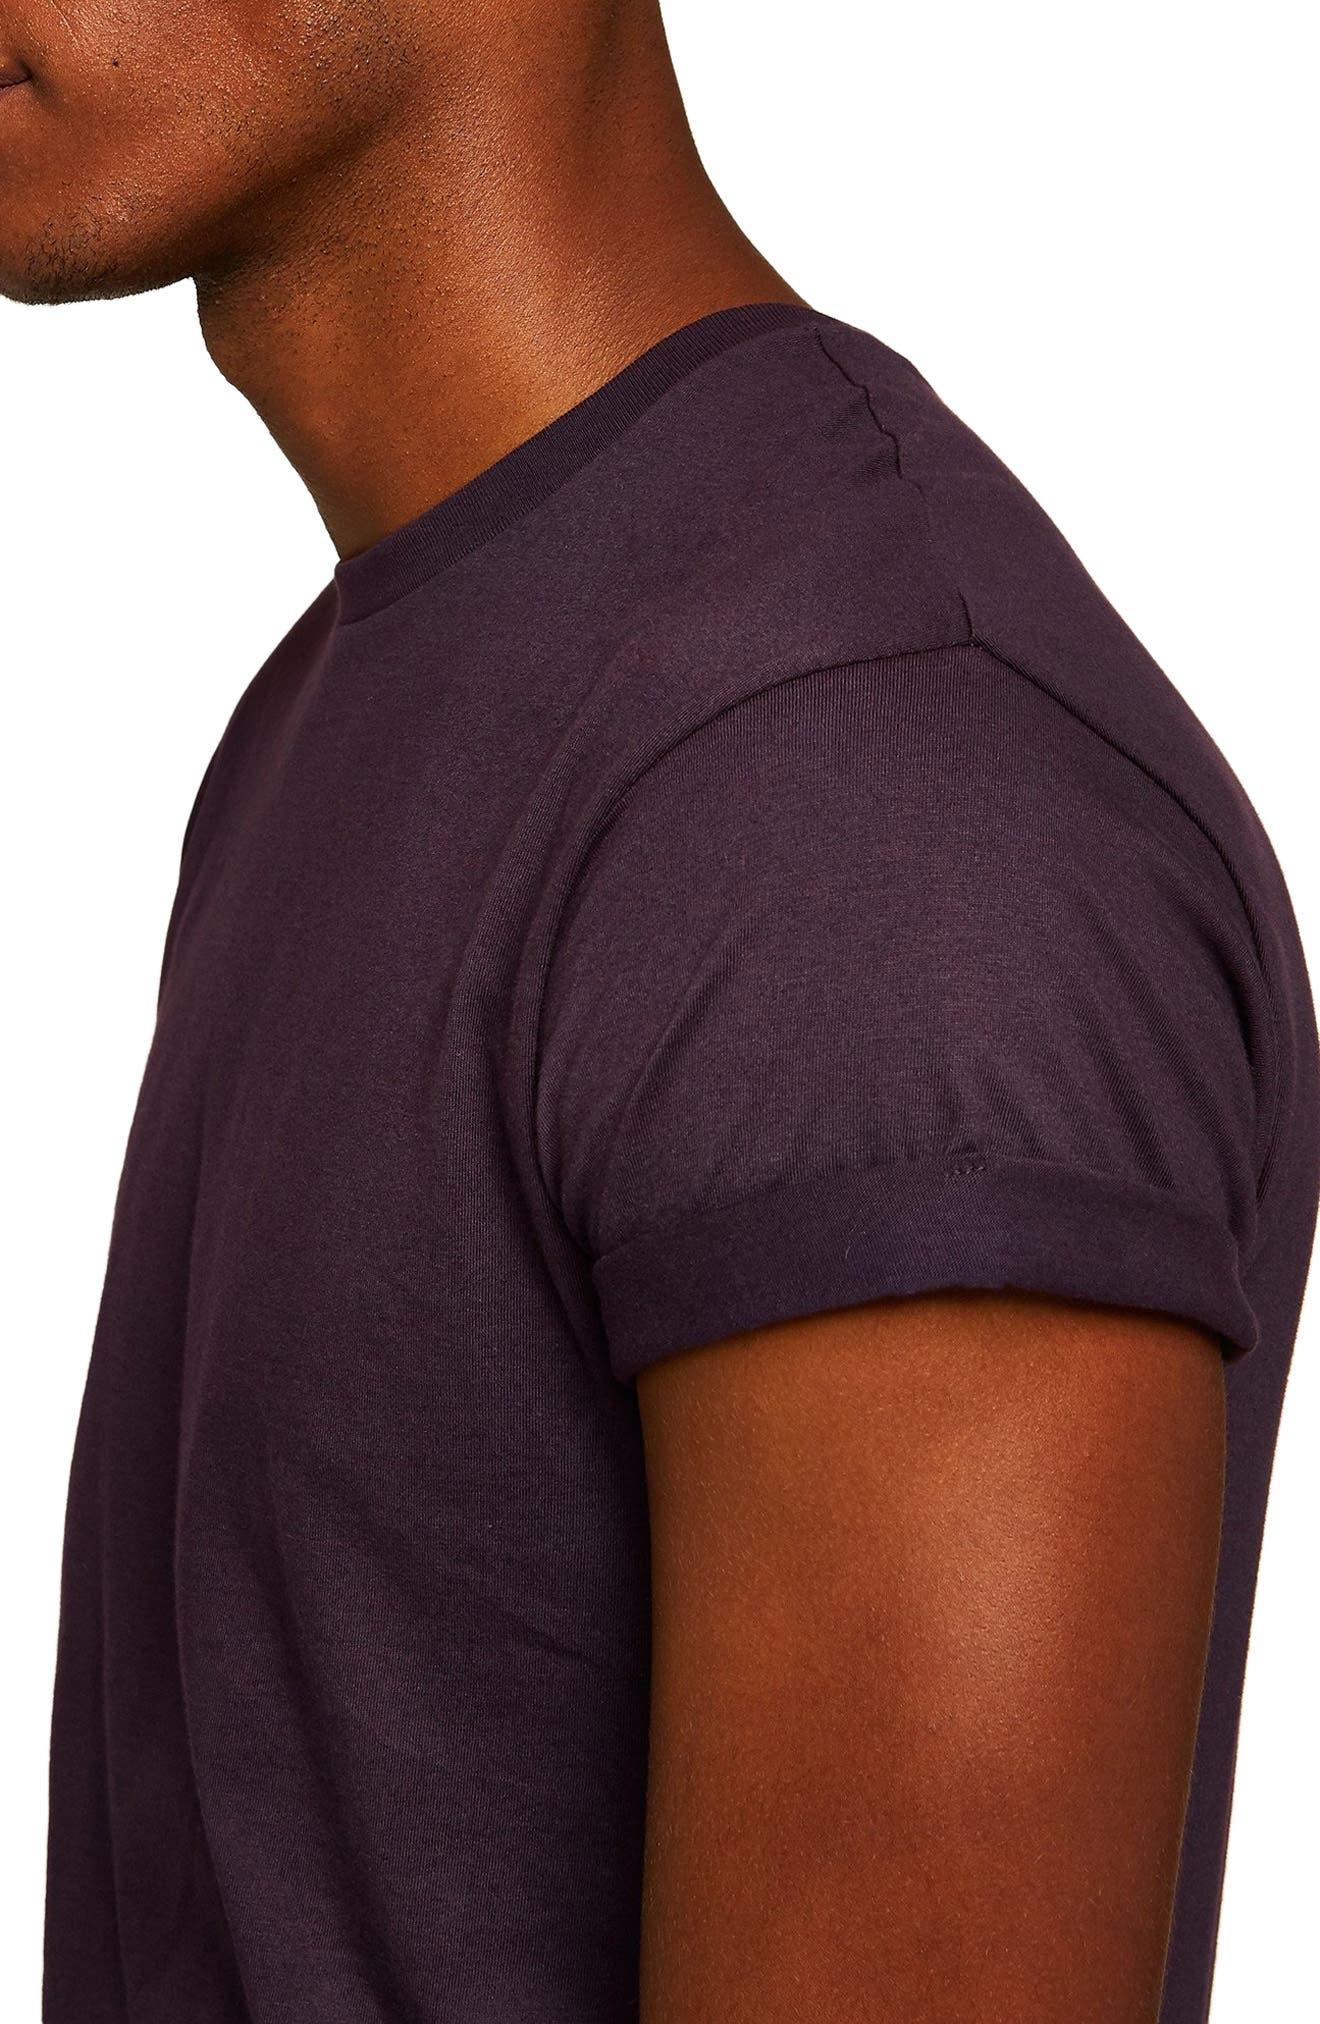 Muscle Fit Roller T-Shirt,                             Alternate thumbnail 3, color,                             PURPLE